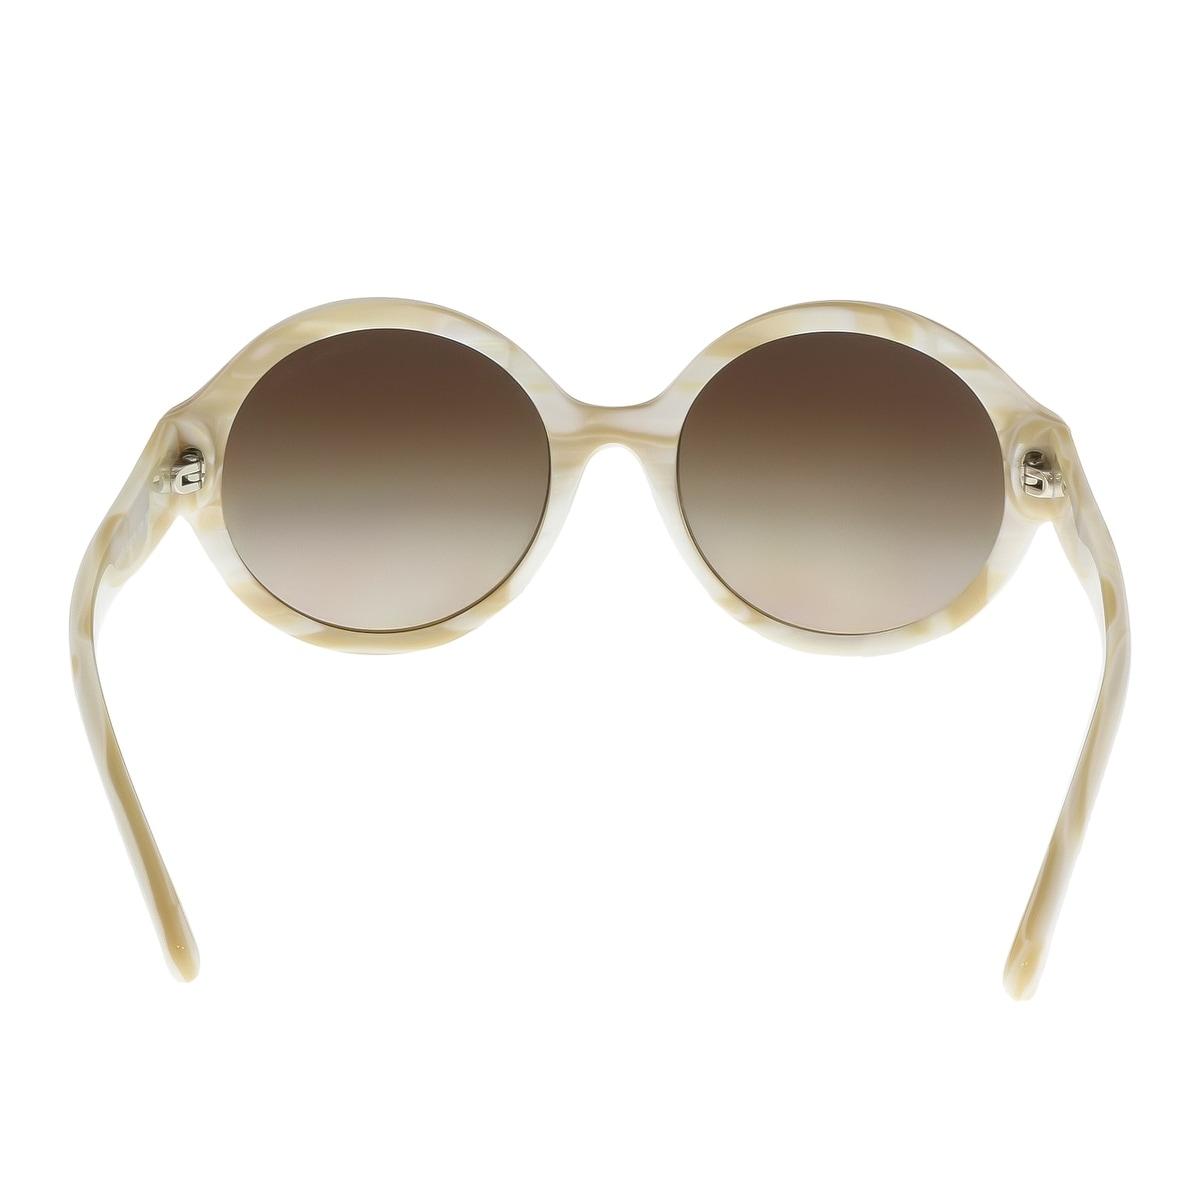 664ddedc20 Shop Michael Kors MK2035 320813 SEASIDE GETAWAY Marble Ivory Round Phantos  Sunglasses - 55-19-135 - Ships To Canada - Overstock - 18182566